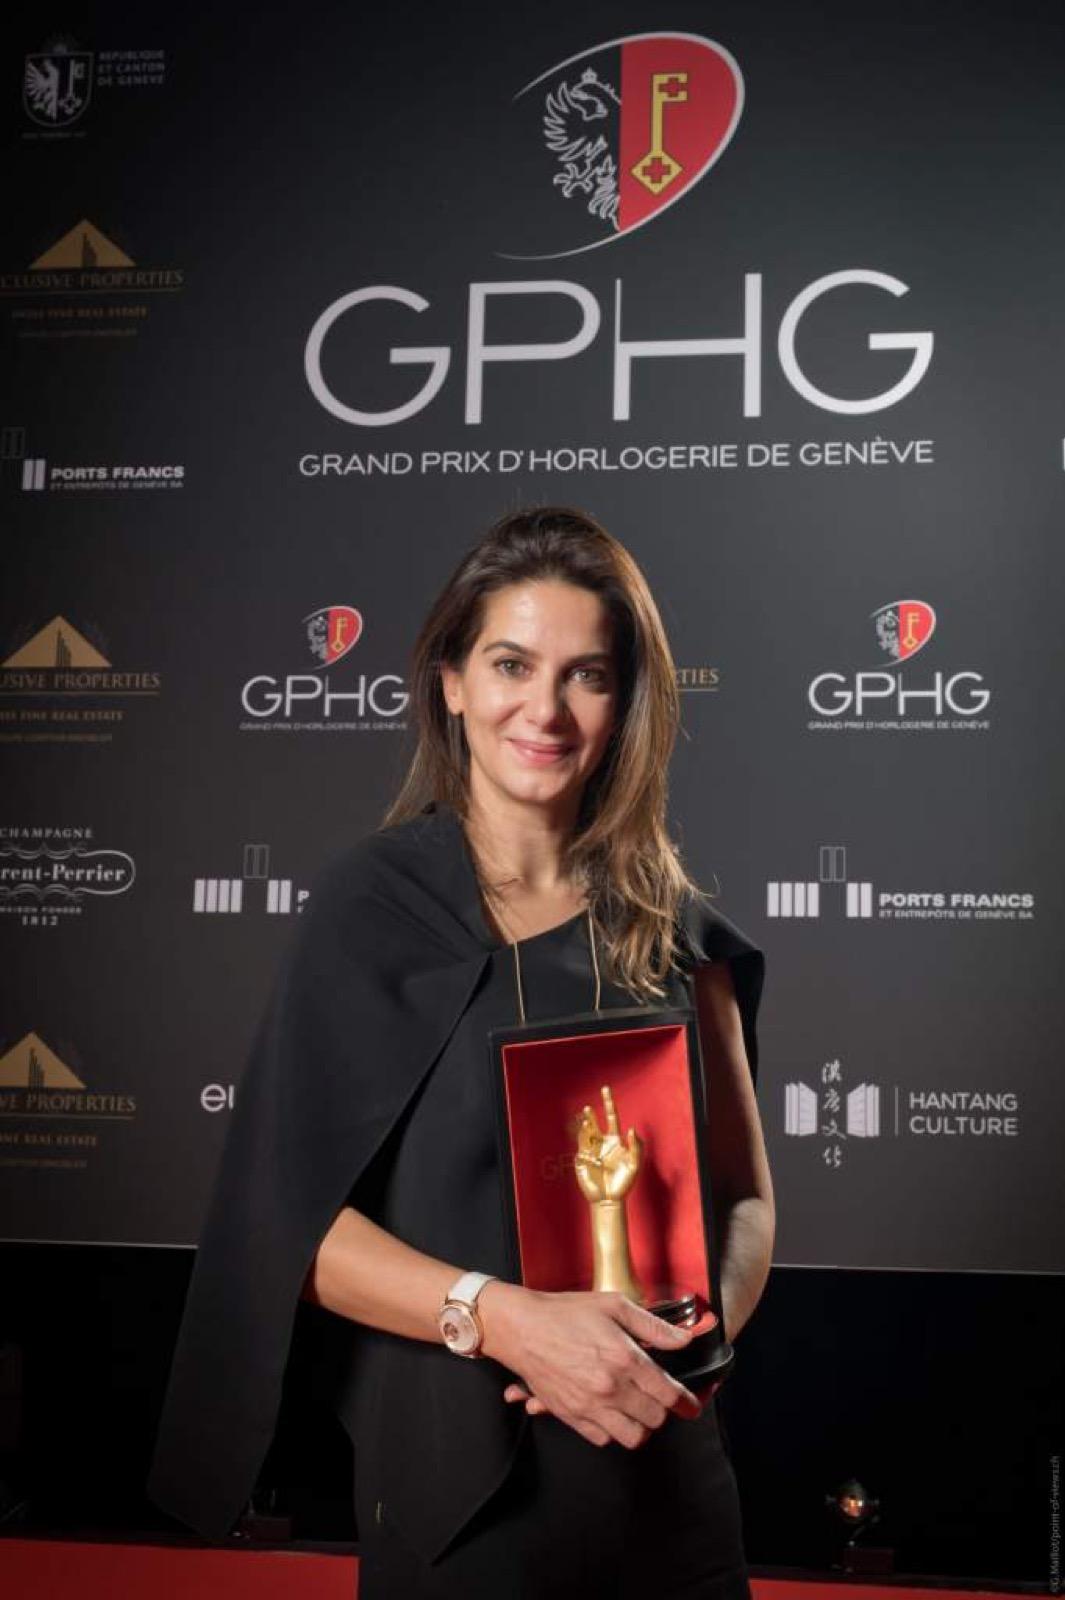 Chabi Nouri, CEO de Piaget GPHG